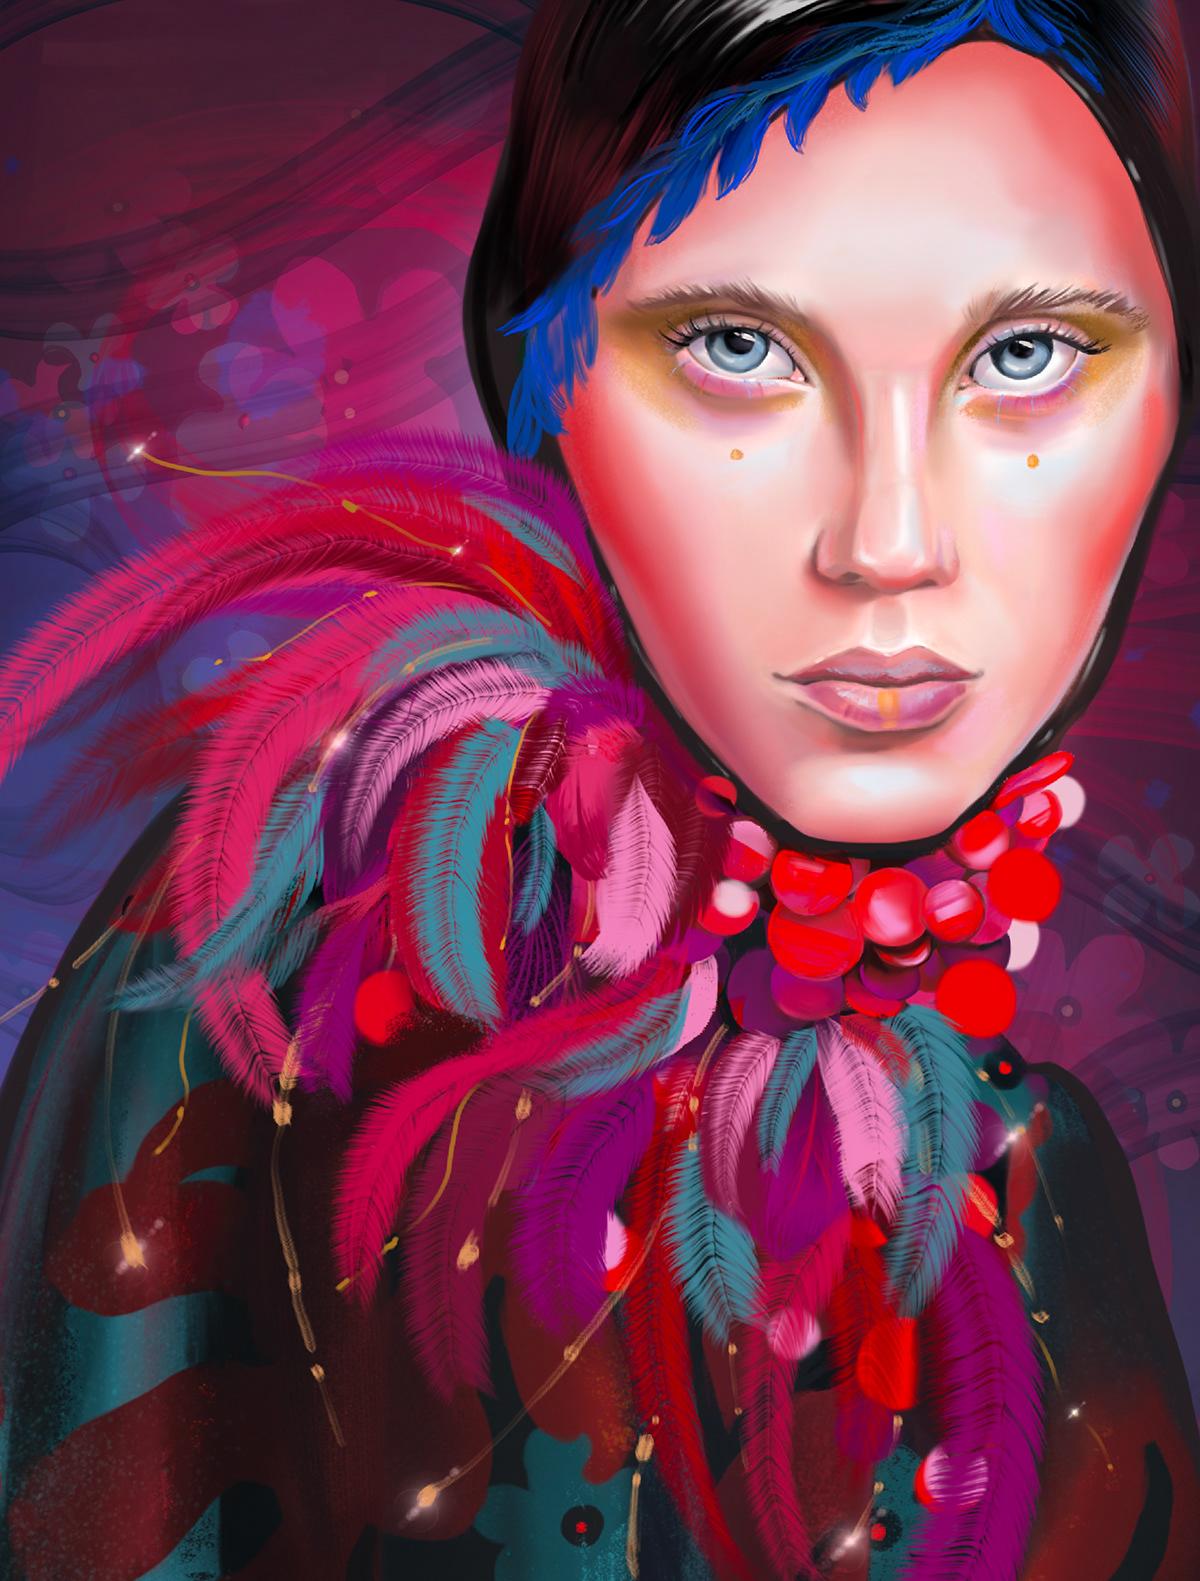 Image may contain: painting, cartoon and human face